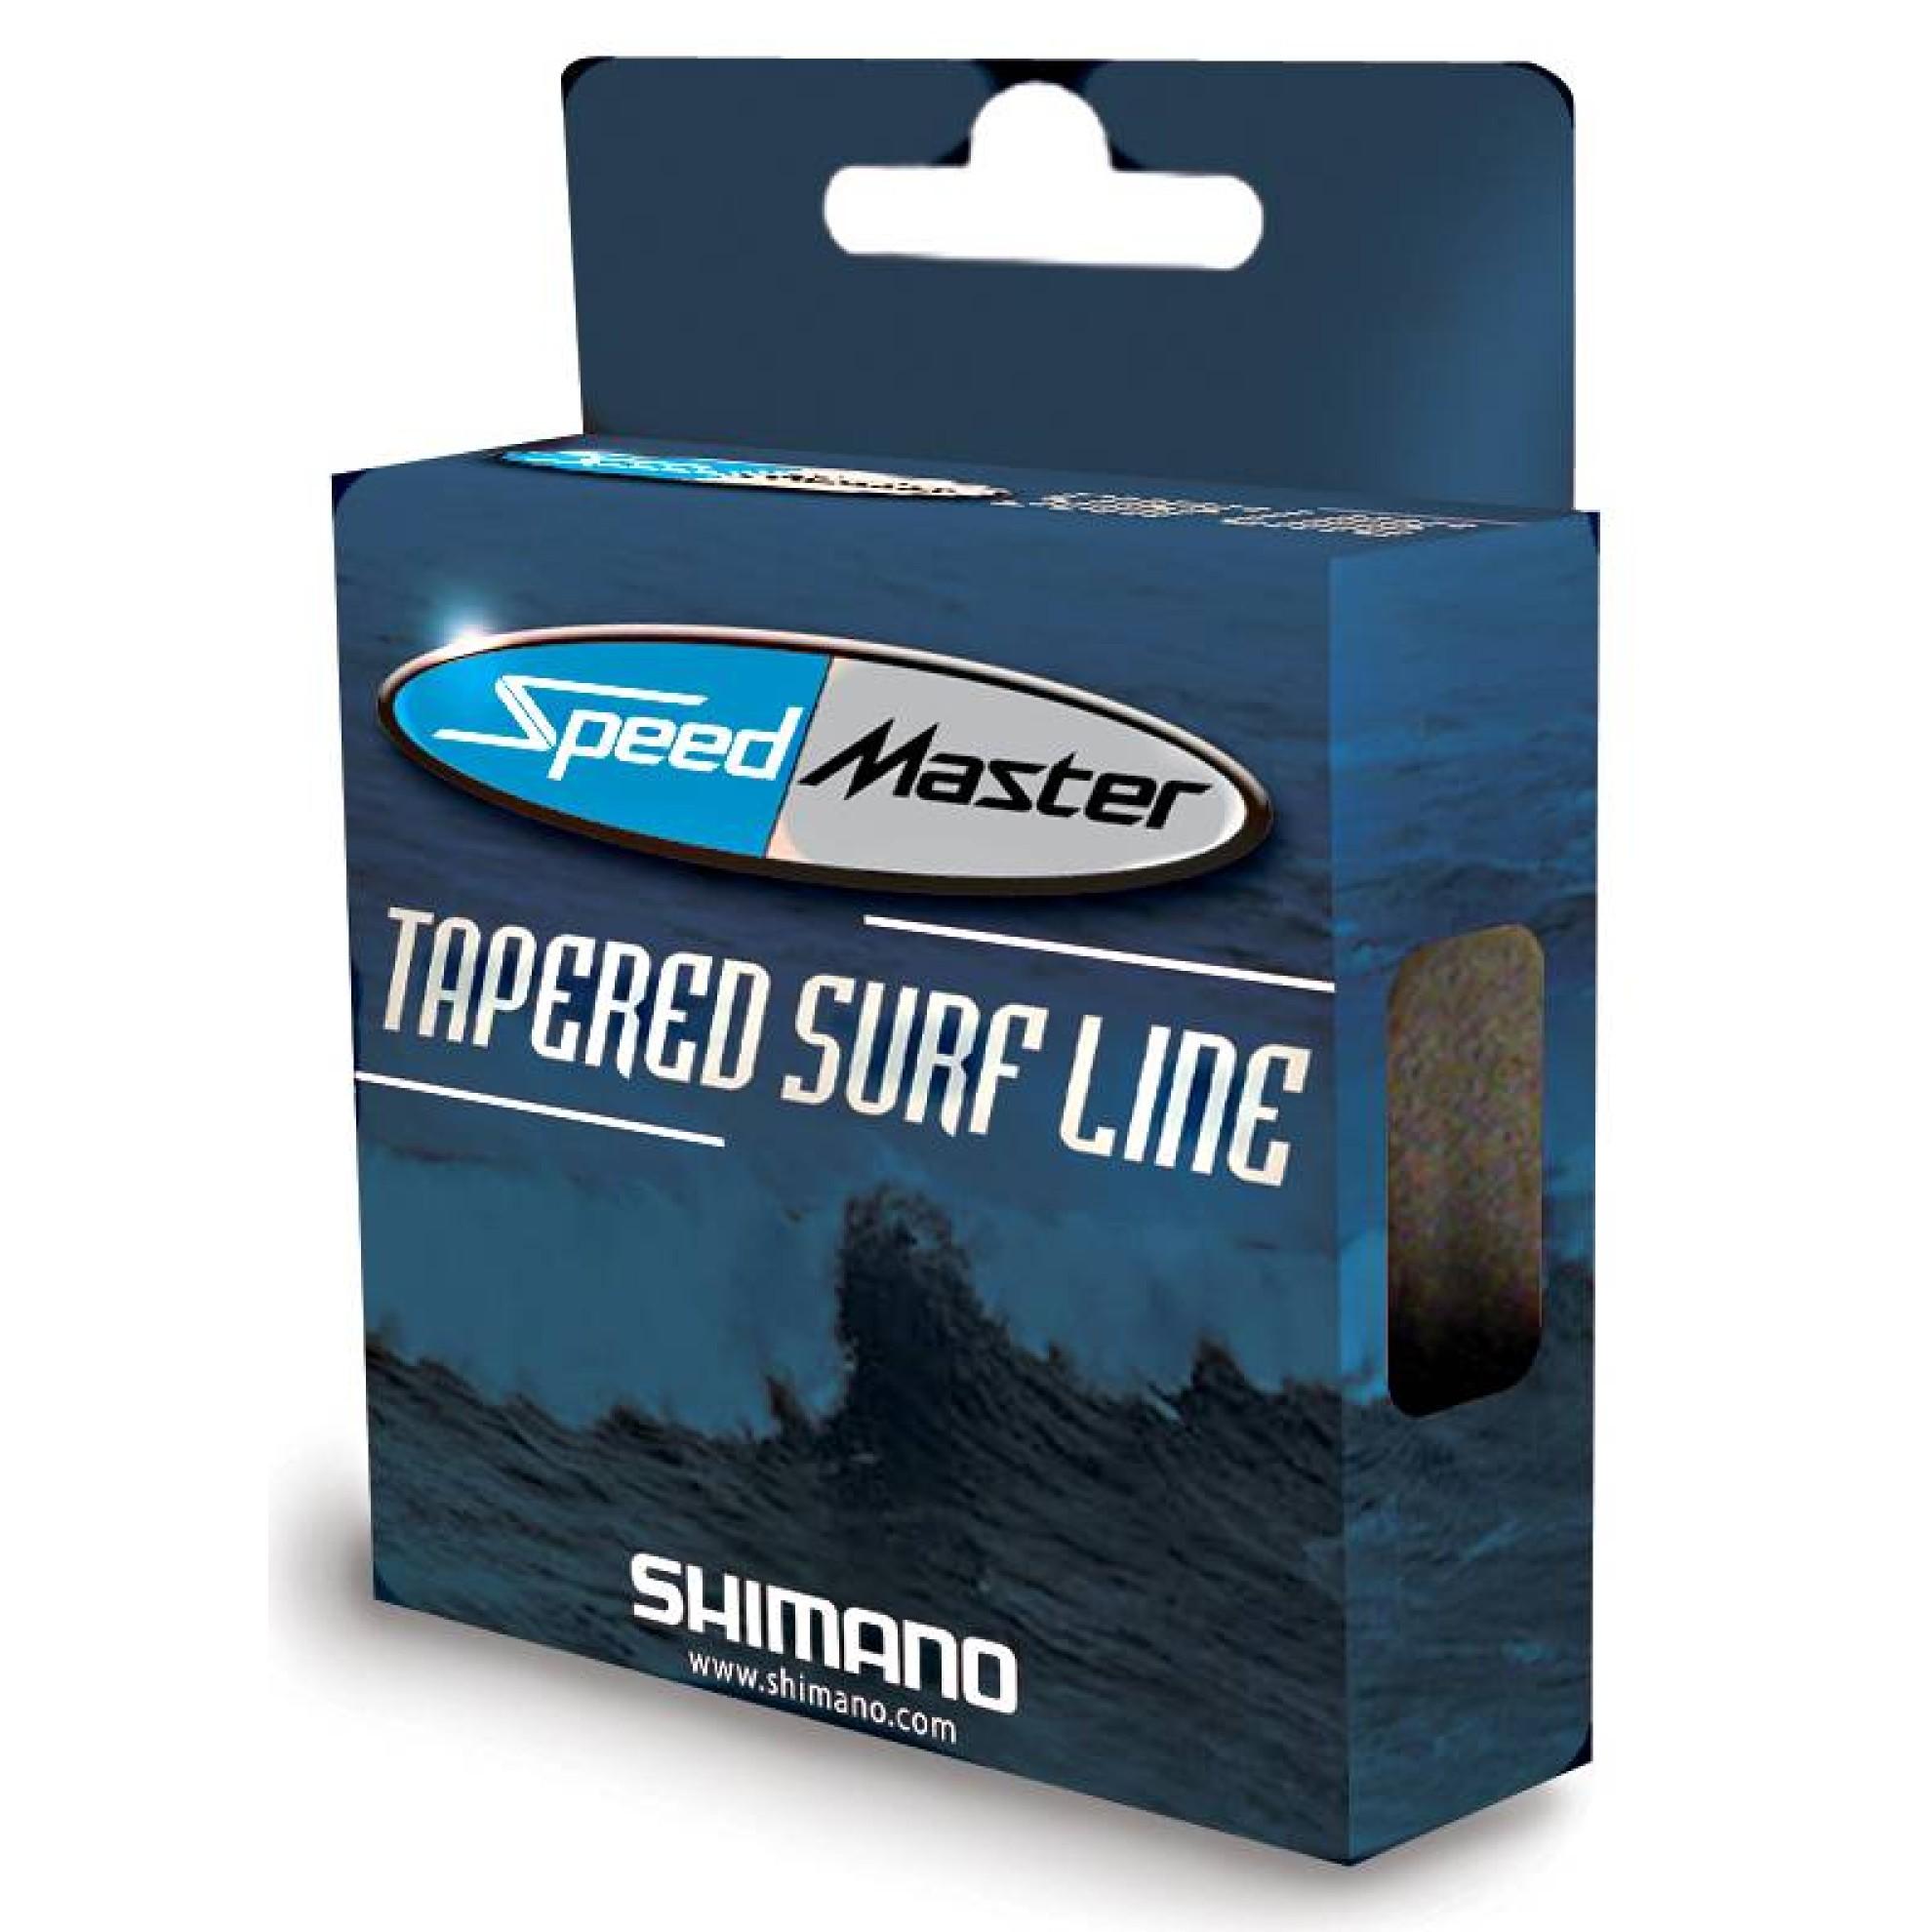 Speedmaster Tapered Surf Line 220mt